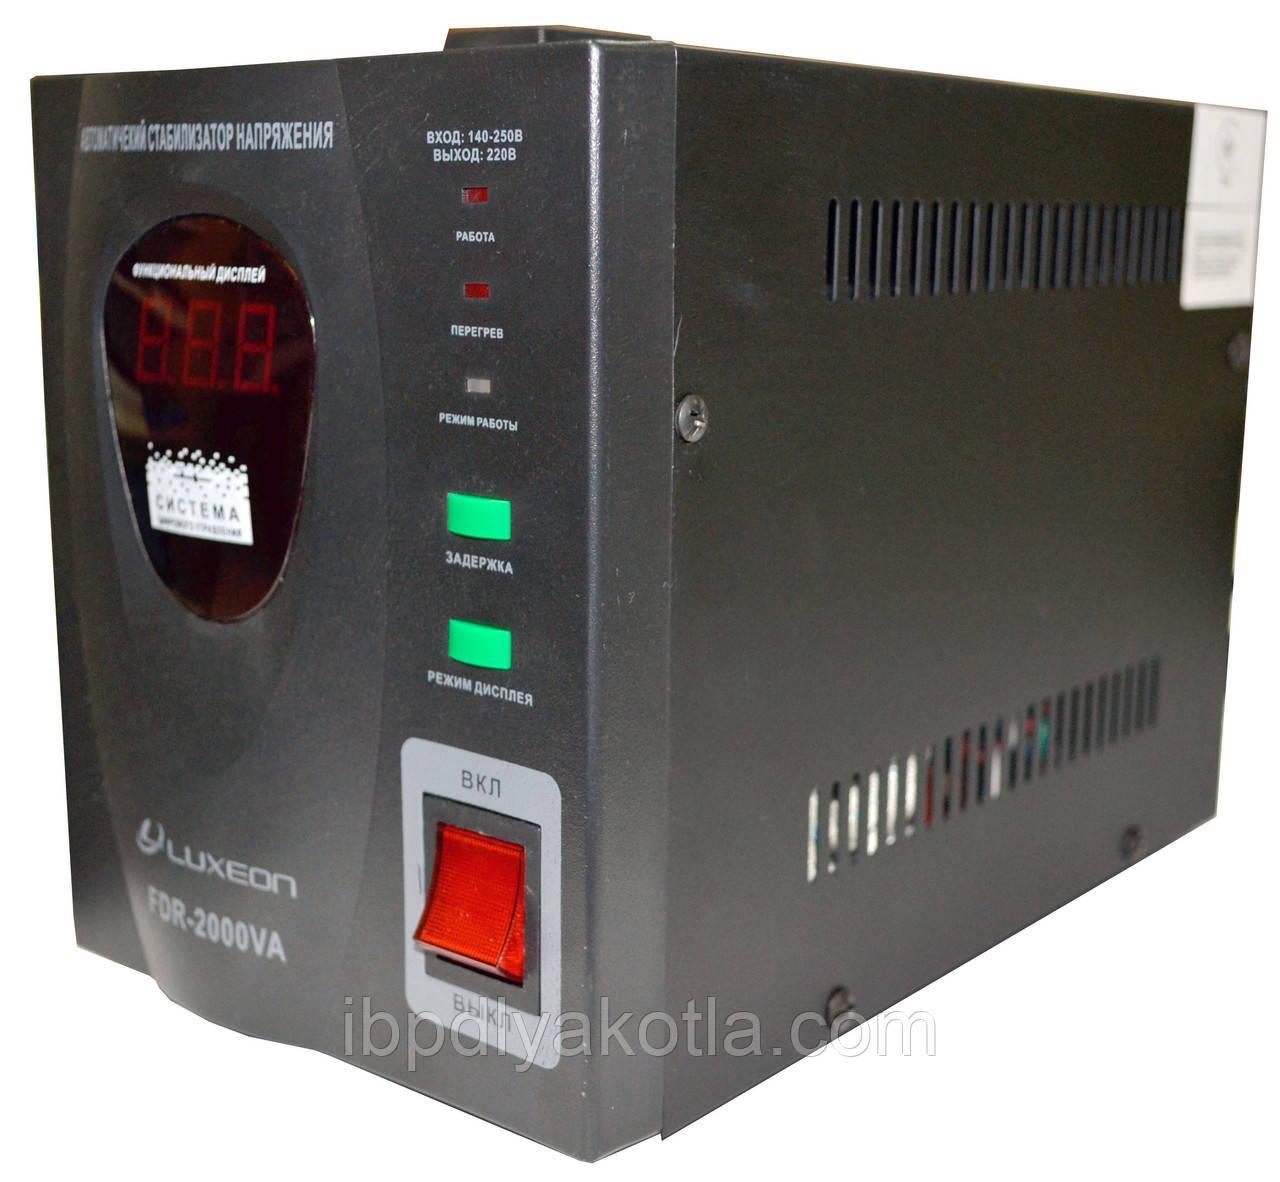 Luxeon FDR-2000 (1400Вт)